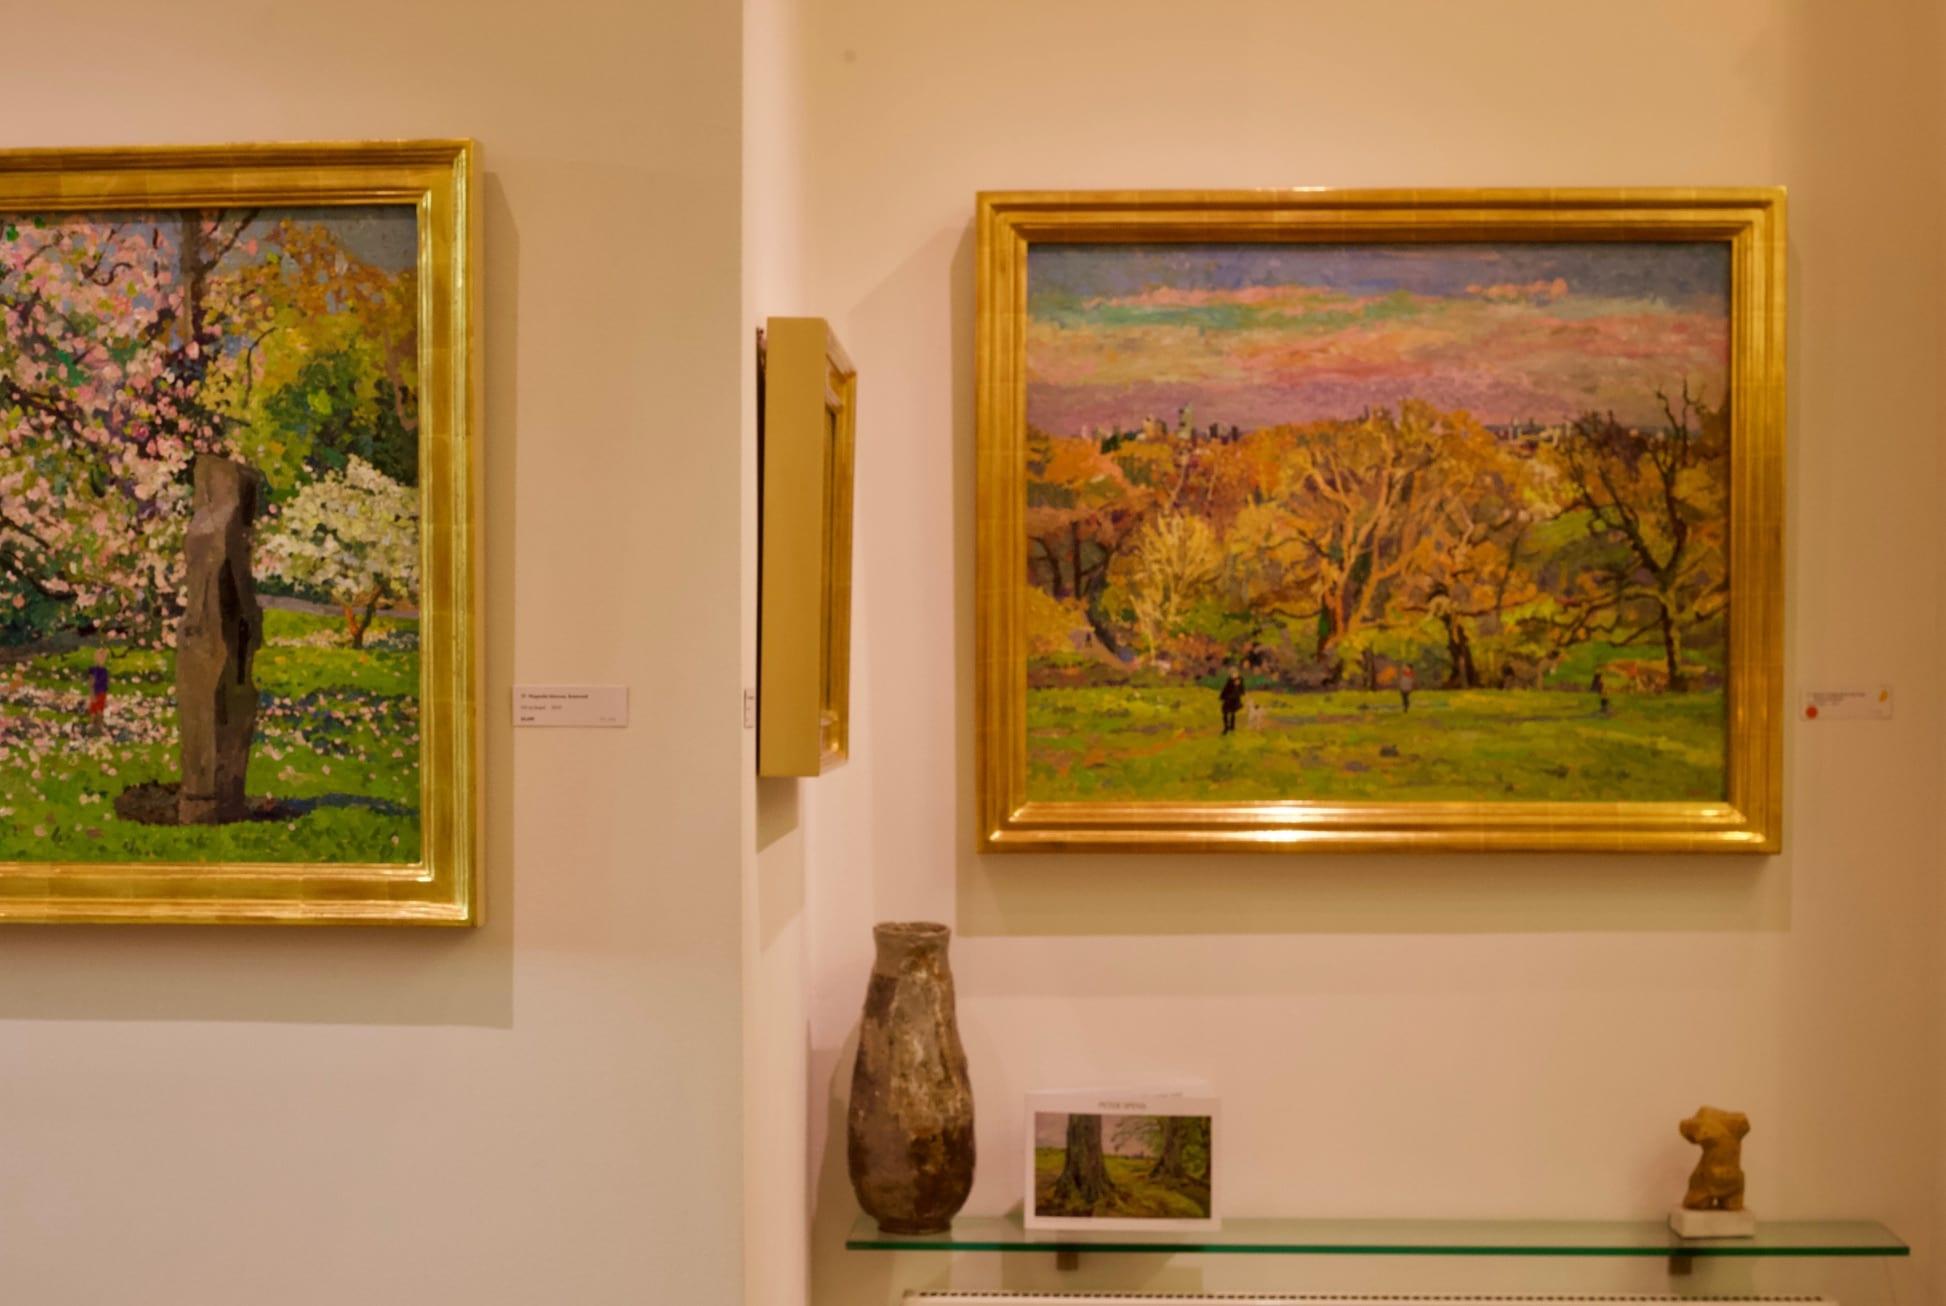 Cranley Gallery Highgate Peter Spens Hampstead Heath Gallery Installation 3